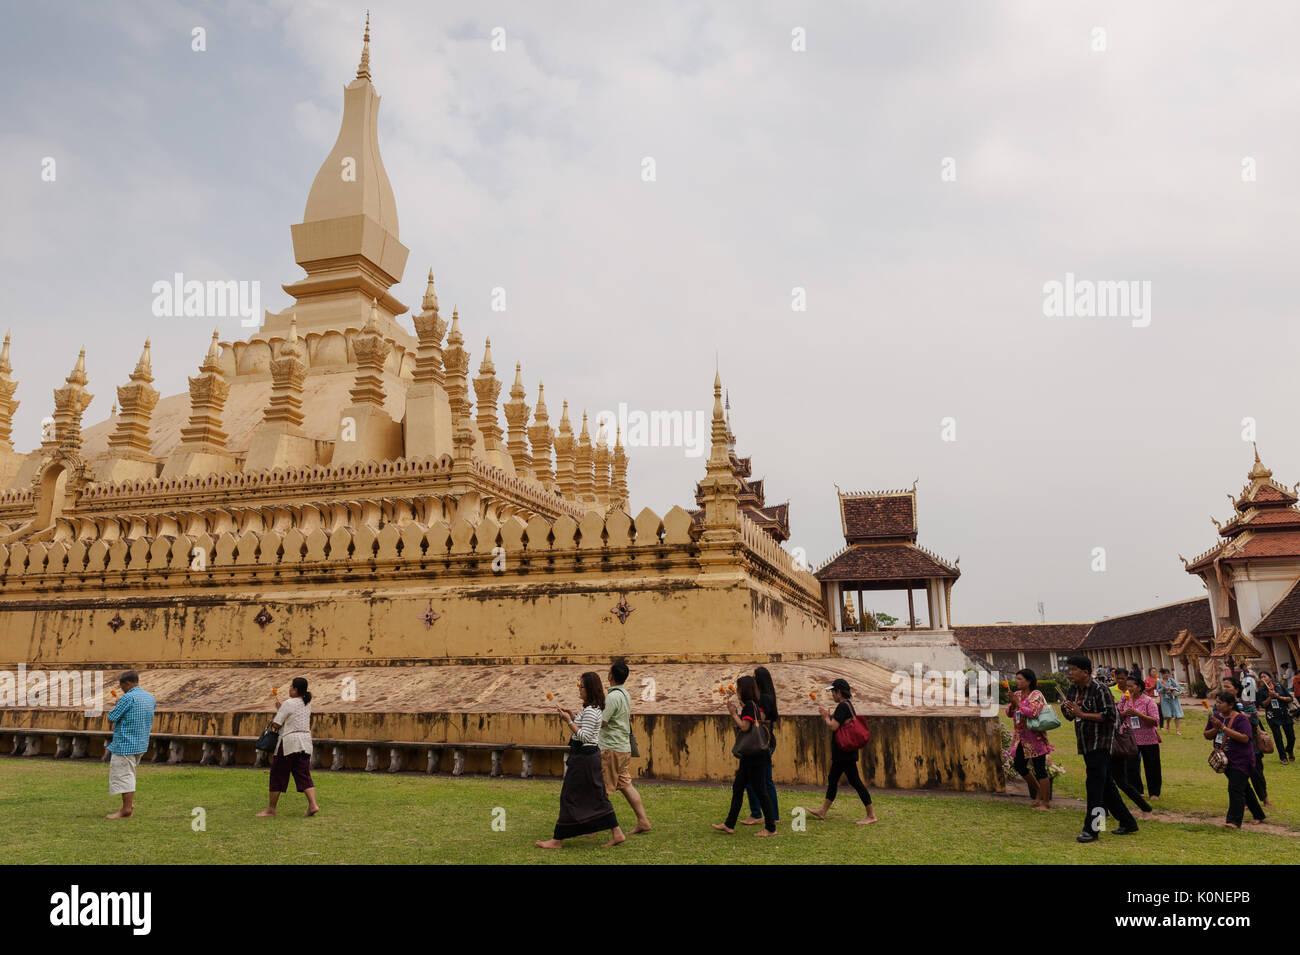 Buddhist pilgrims walk around the Great Stupa, a national symbol of Laos, Pha That Luang, Vientiane. - Stock Image